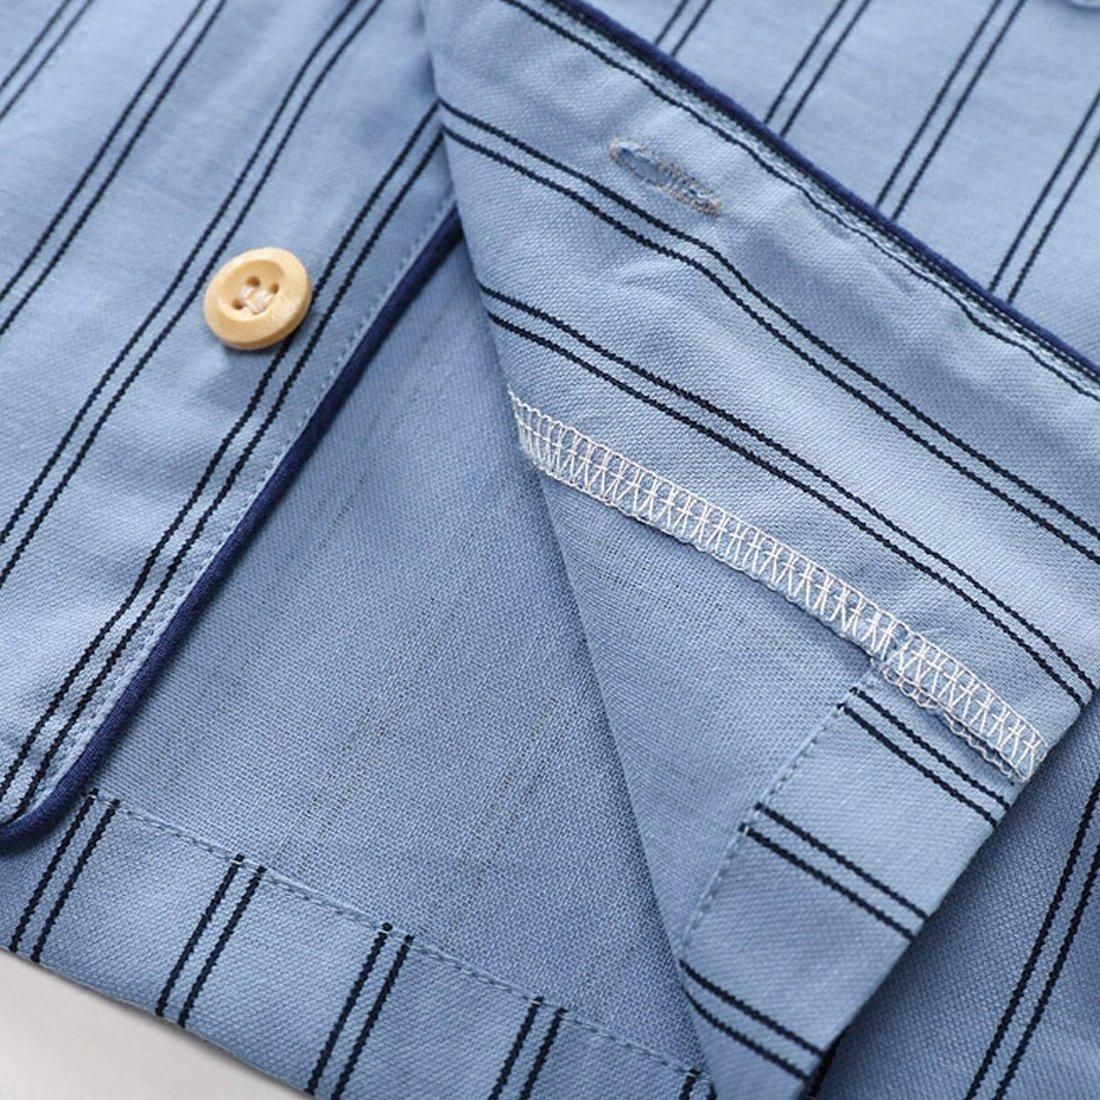 PAUBOLI Boys Button Down Pajamas Set Short Sleeve Organic Cotton Striped Sleepwear Loungewear (6-7 Years) by PAUBOLI (Image #4)